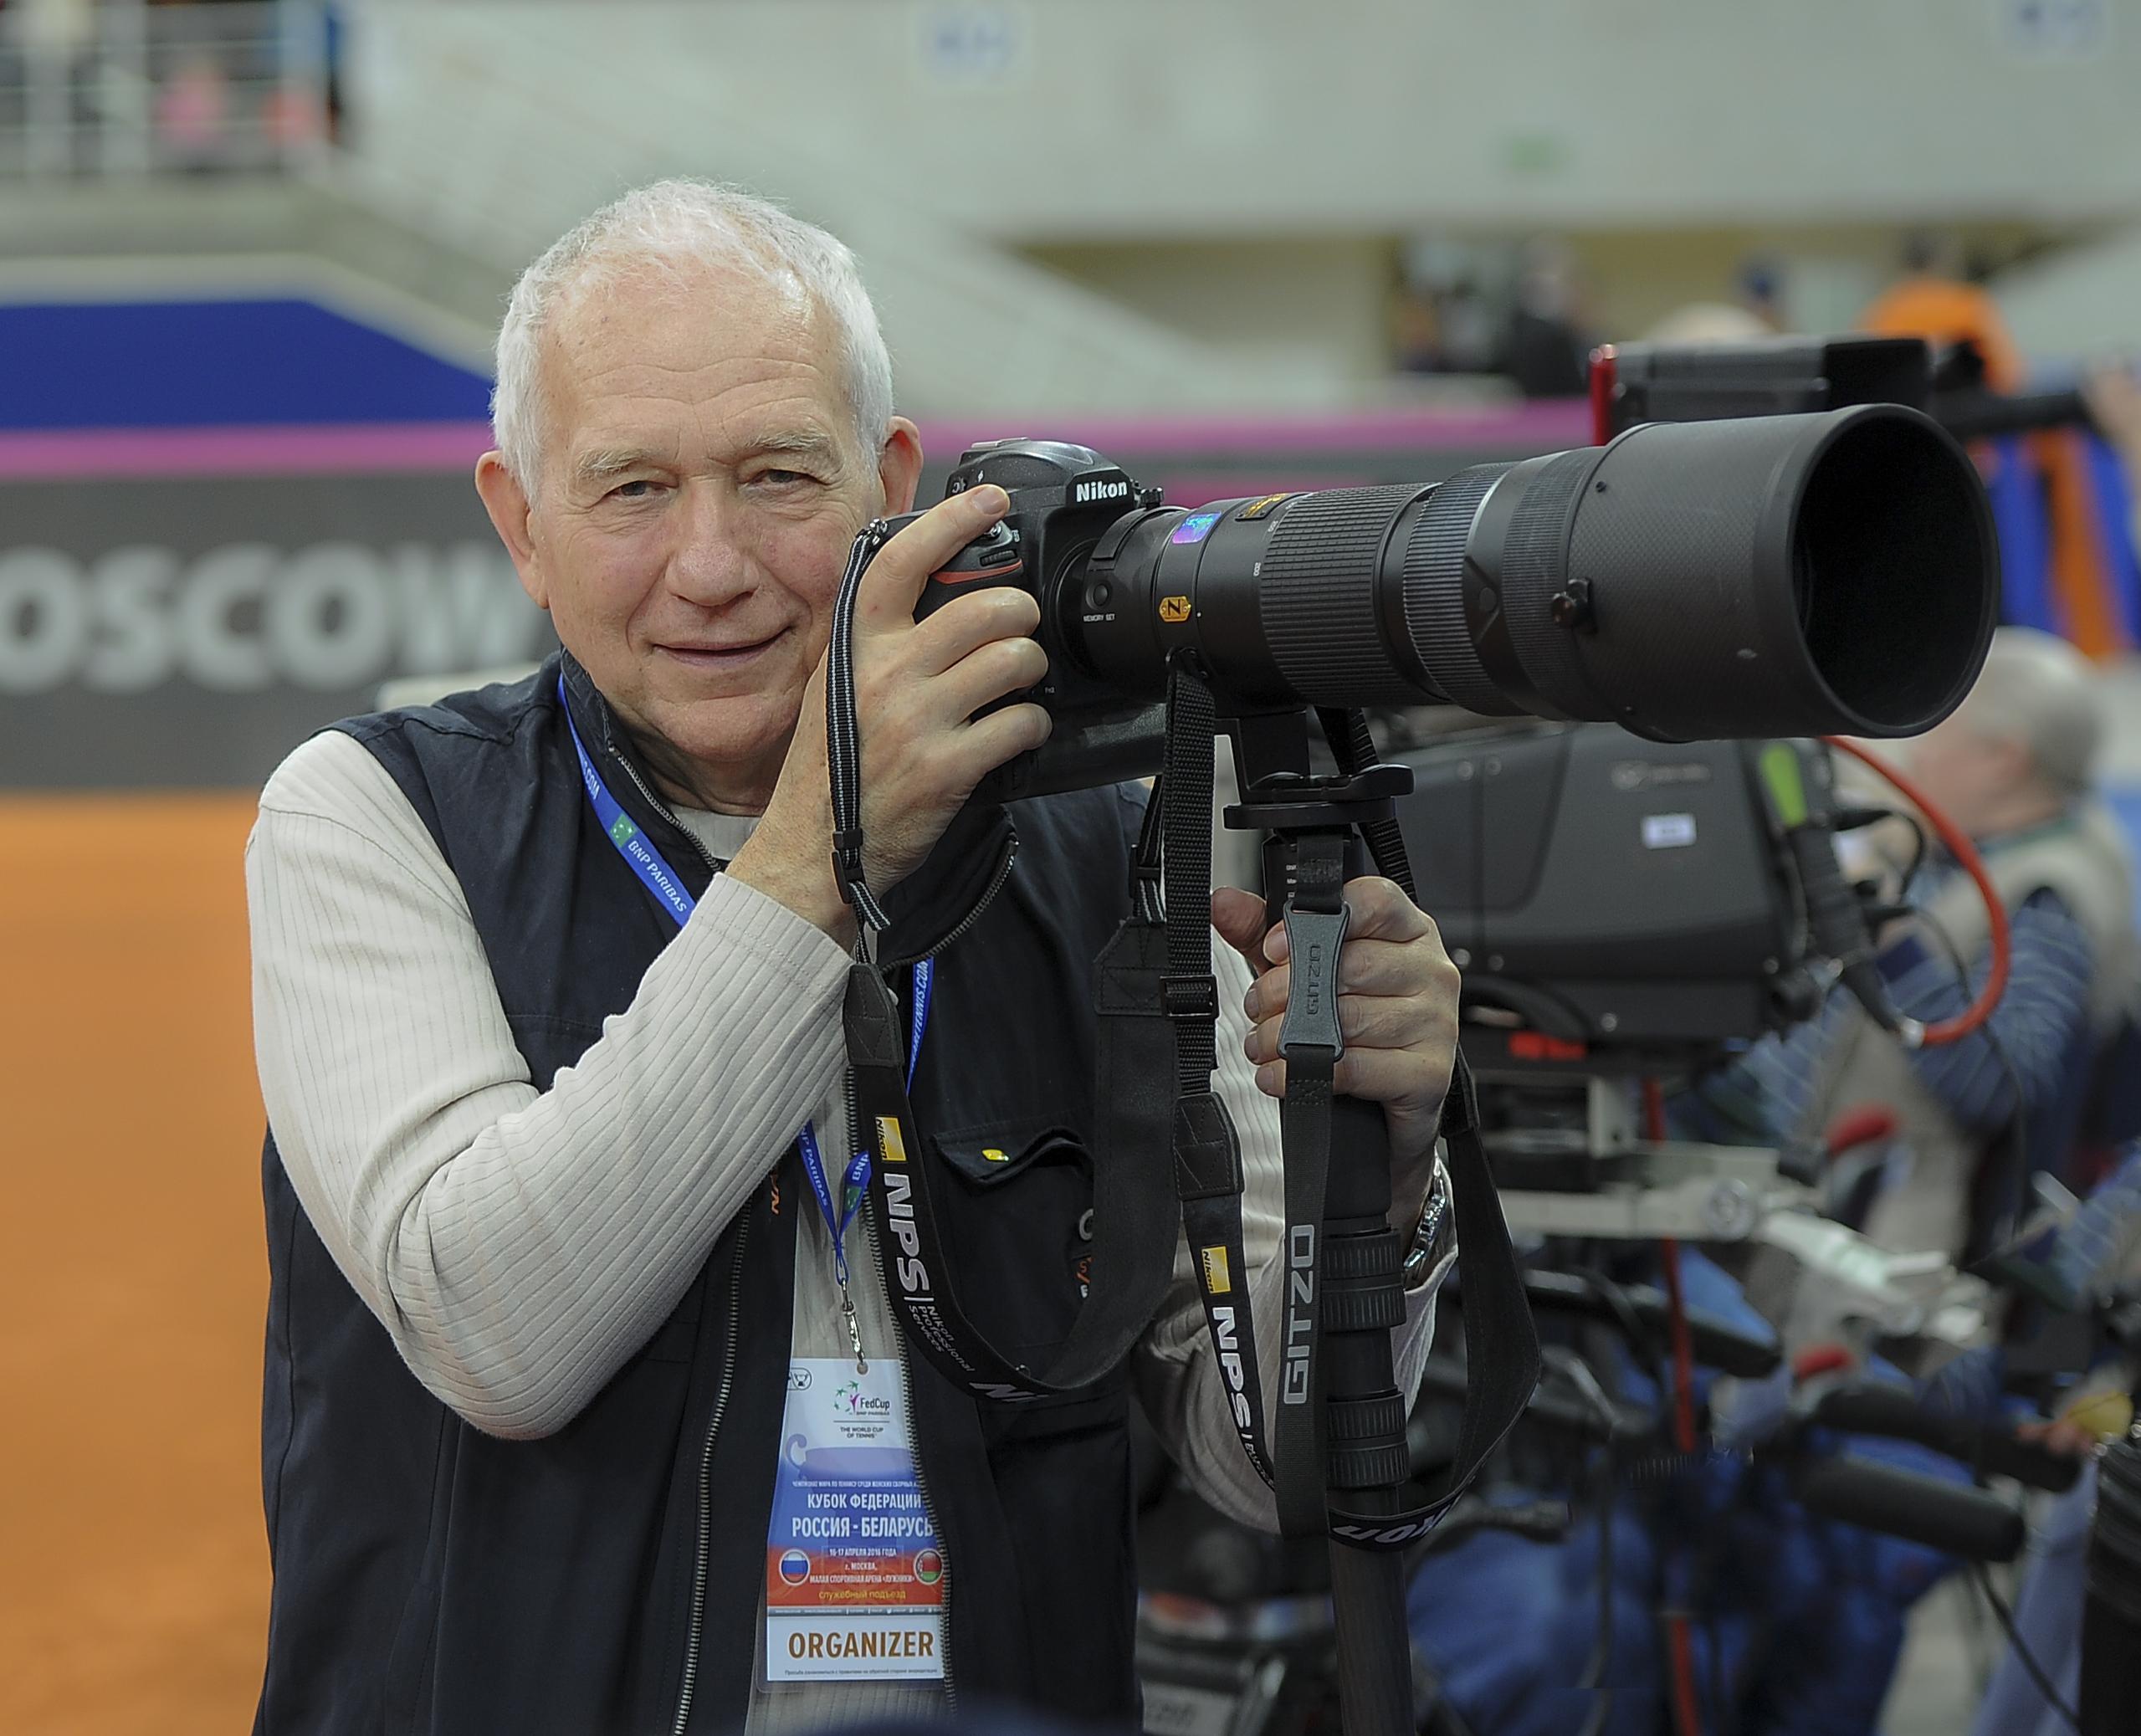 вакансии спортивного фотографа только